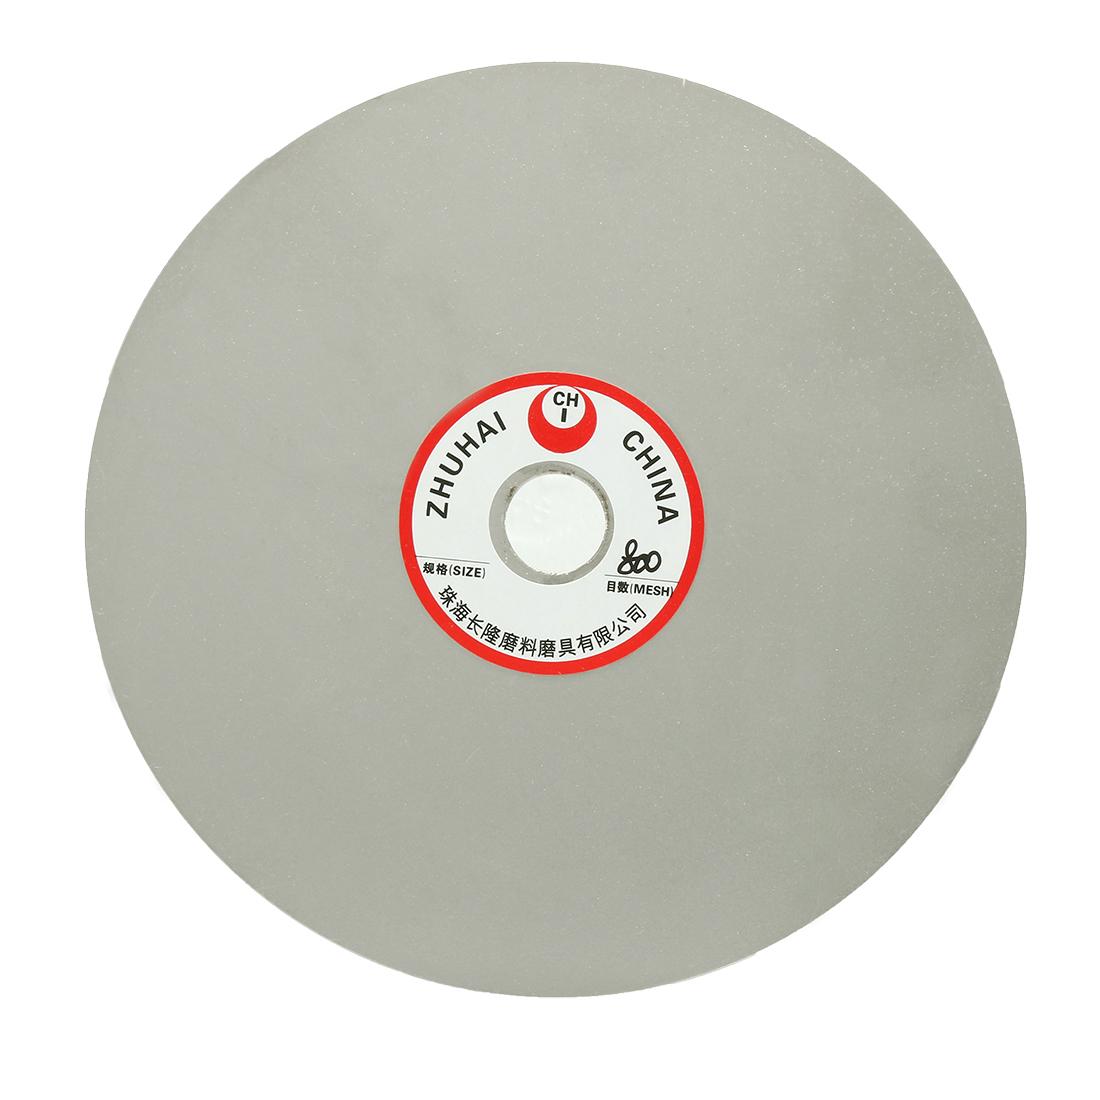 6-inch Grit 800 Diamond Coated Flat Lap Wheel Grinding Disc Polishing Tool